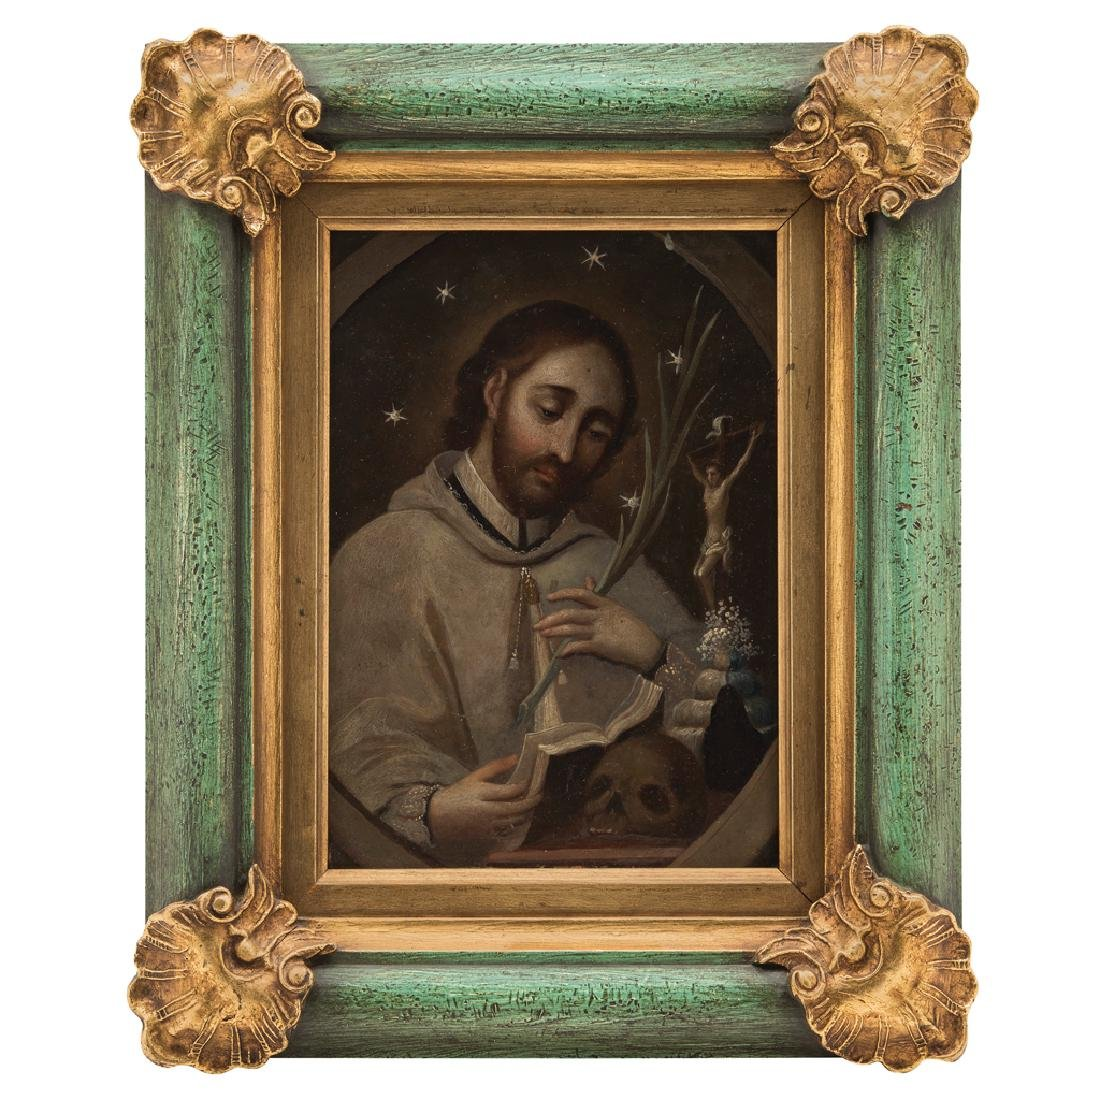 SAINT JOHN OF NEPOMUK. MEXICO, 19th CENTURY. Oil on